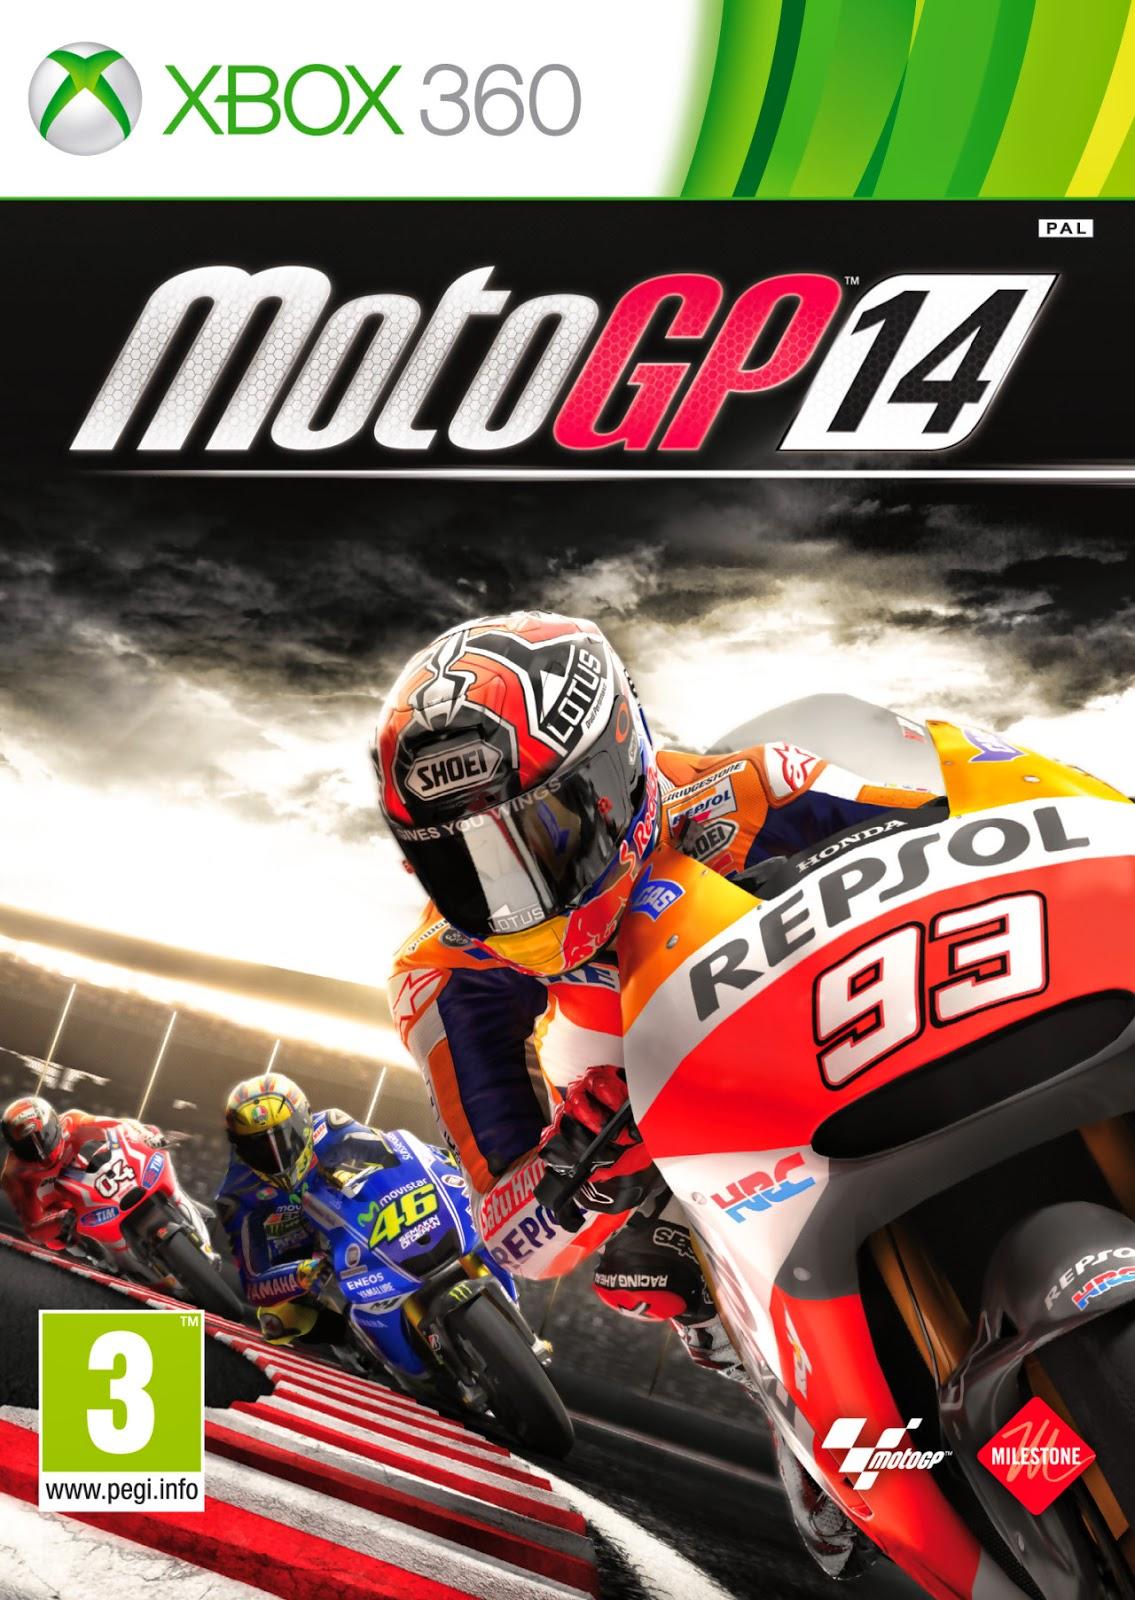 MotoGP 14 XBOX 360 Cover Caratula